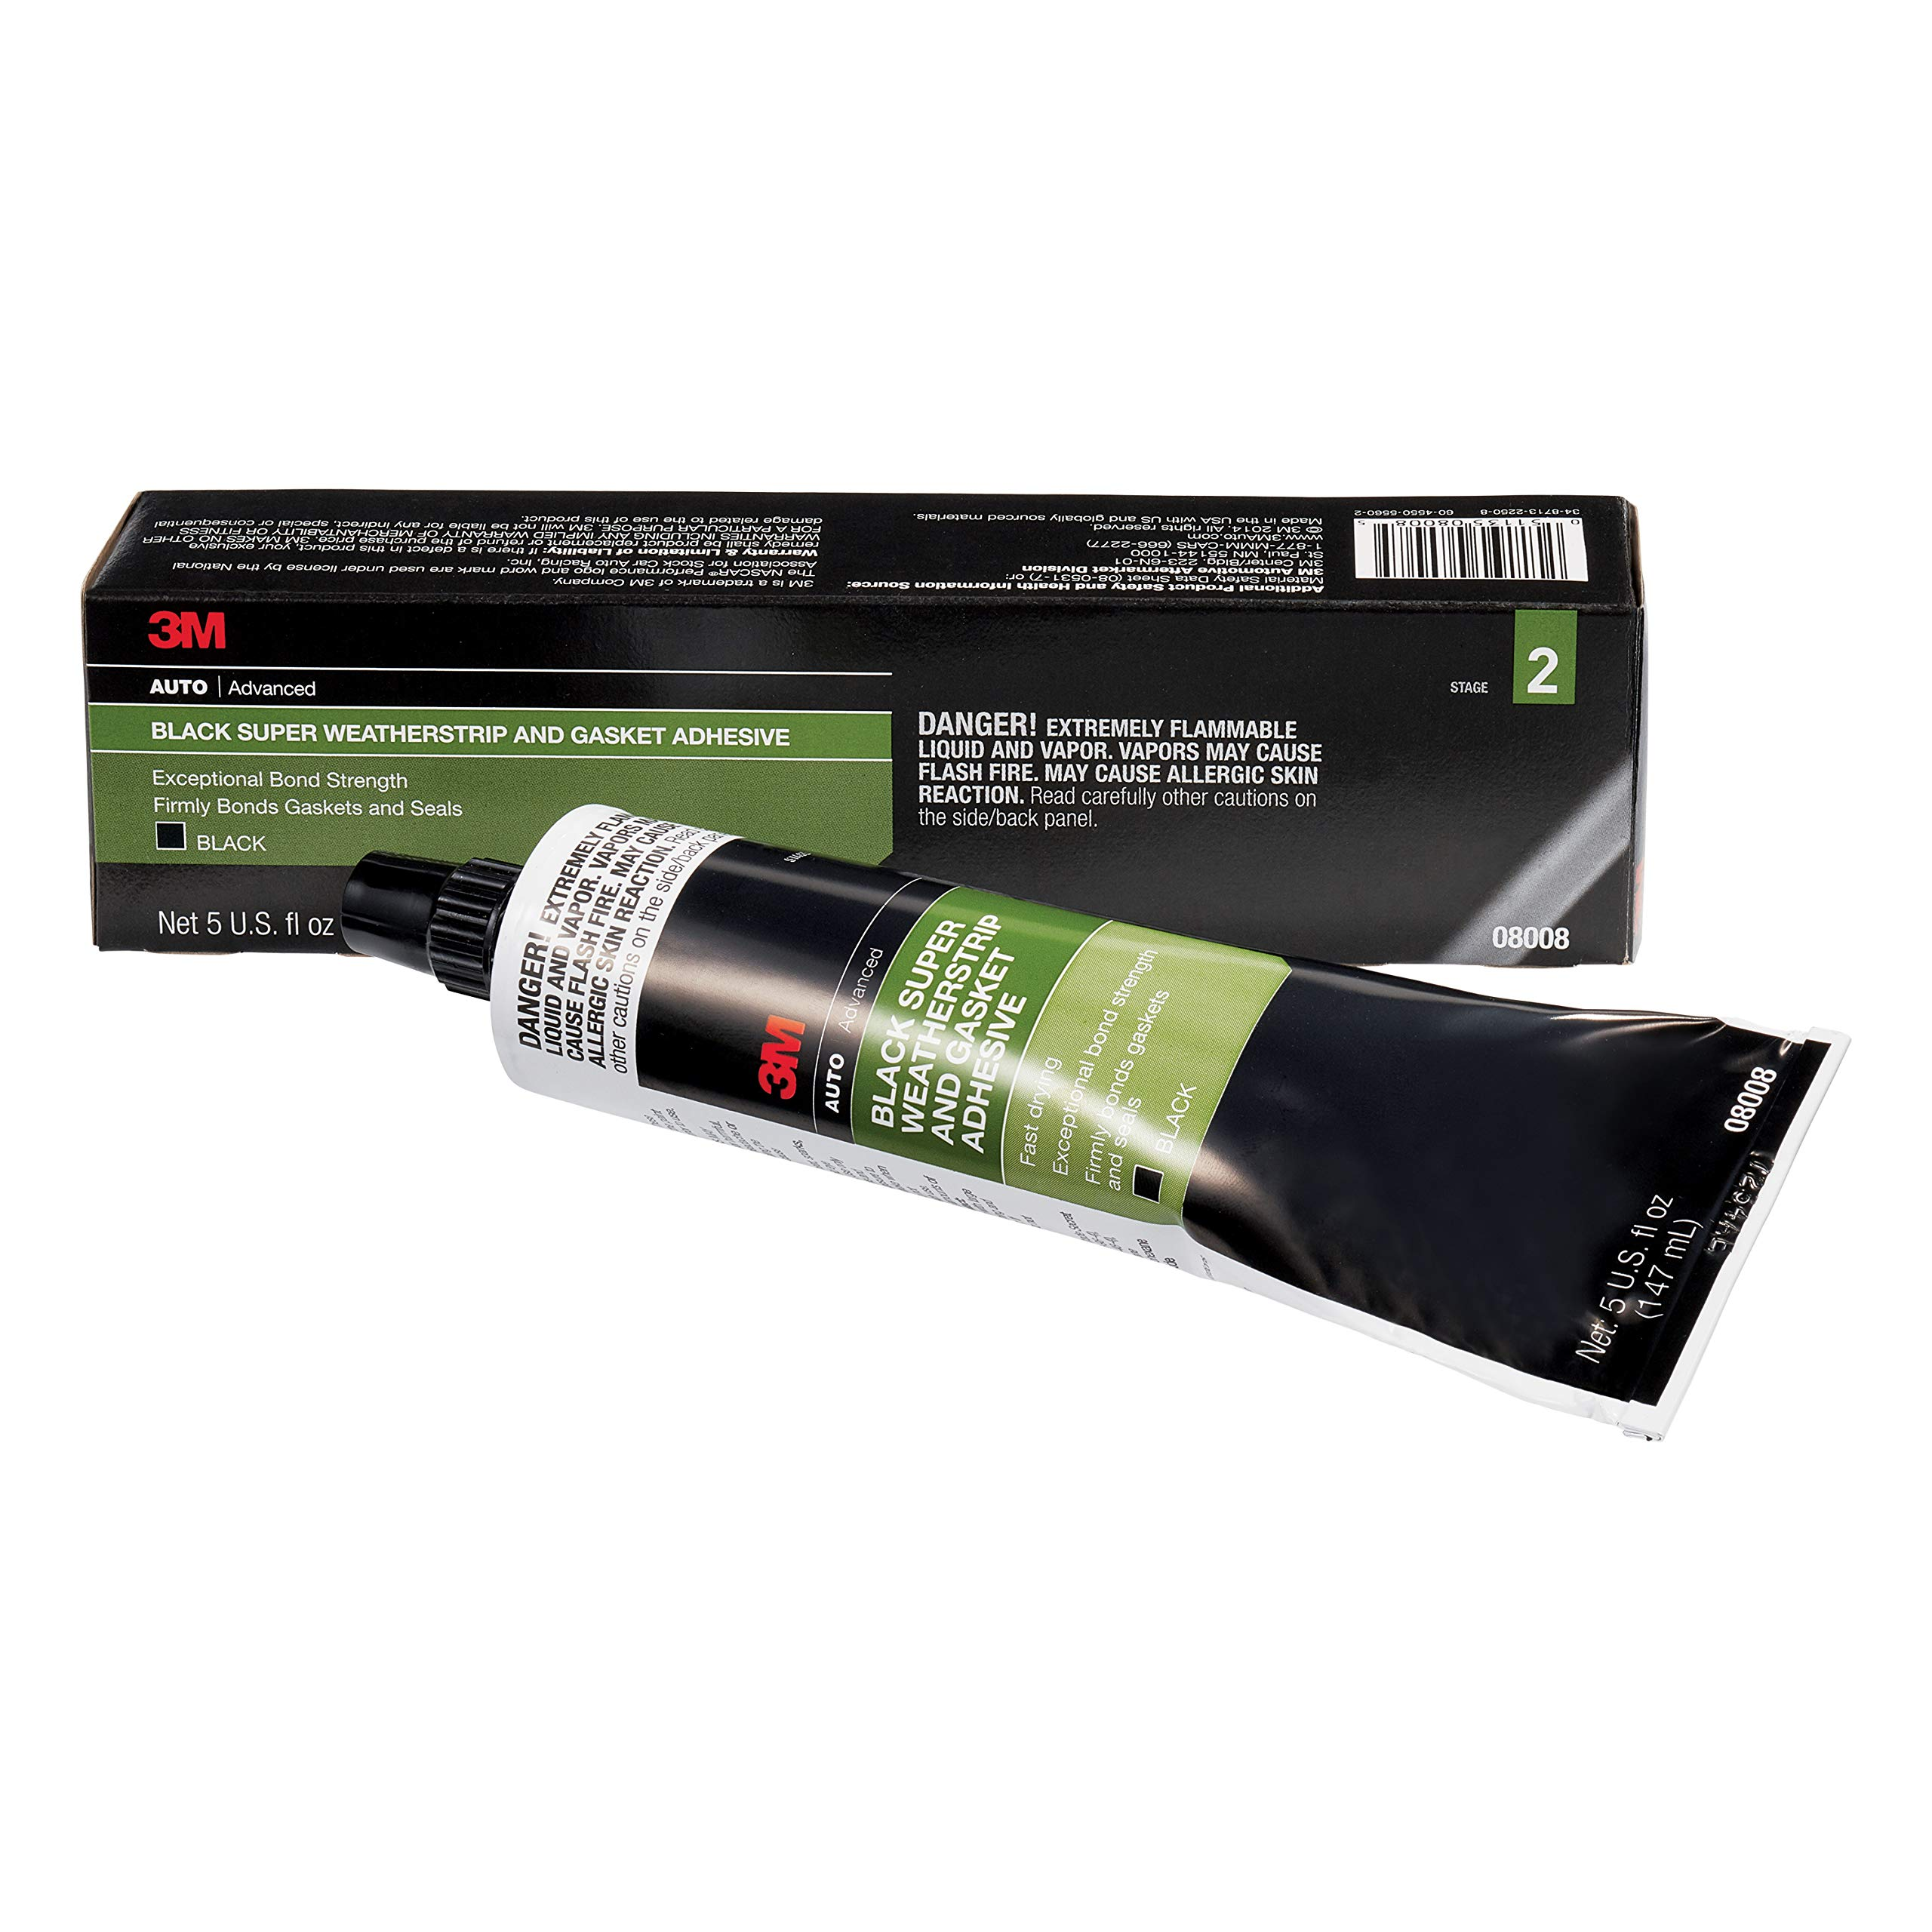 3M Black Super Weatherstrip and Gasket Adhesive, 08008, 5 fl oz